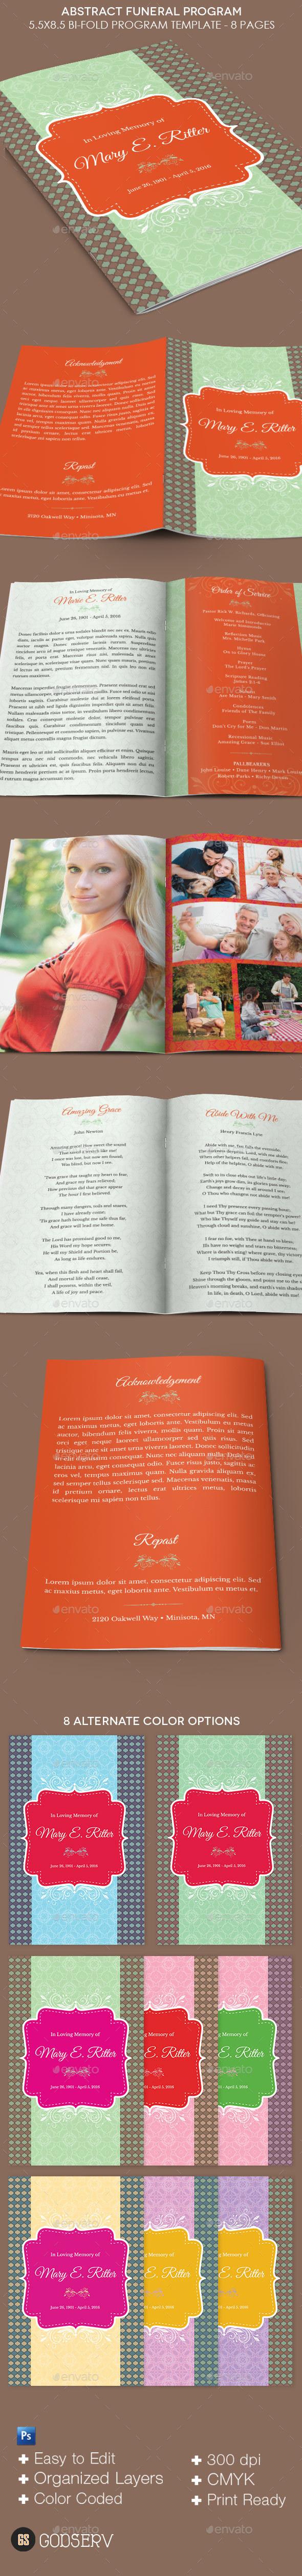 Abstract Funeral Program Template - Informational Brochures